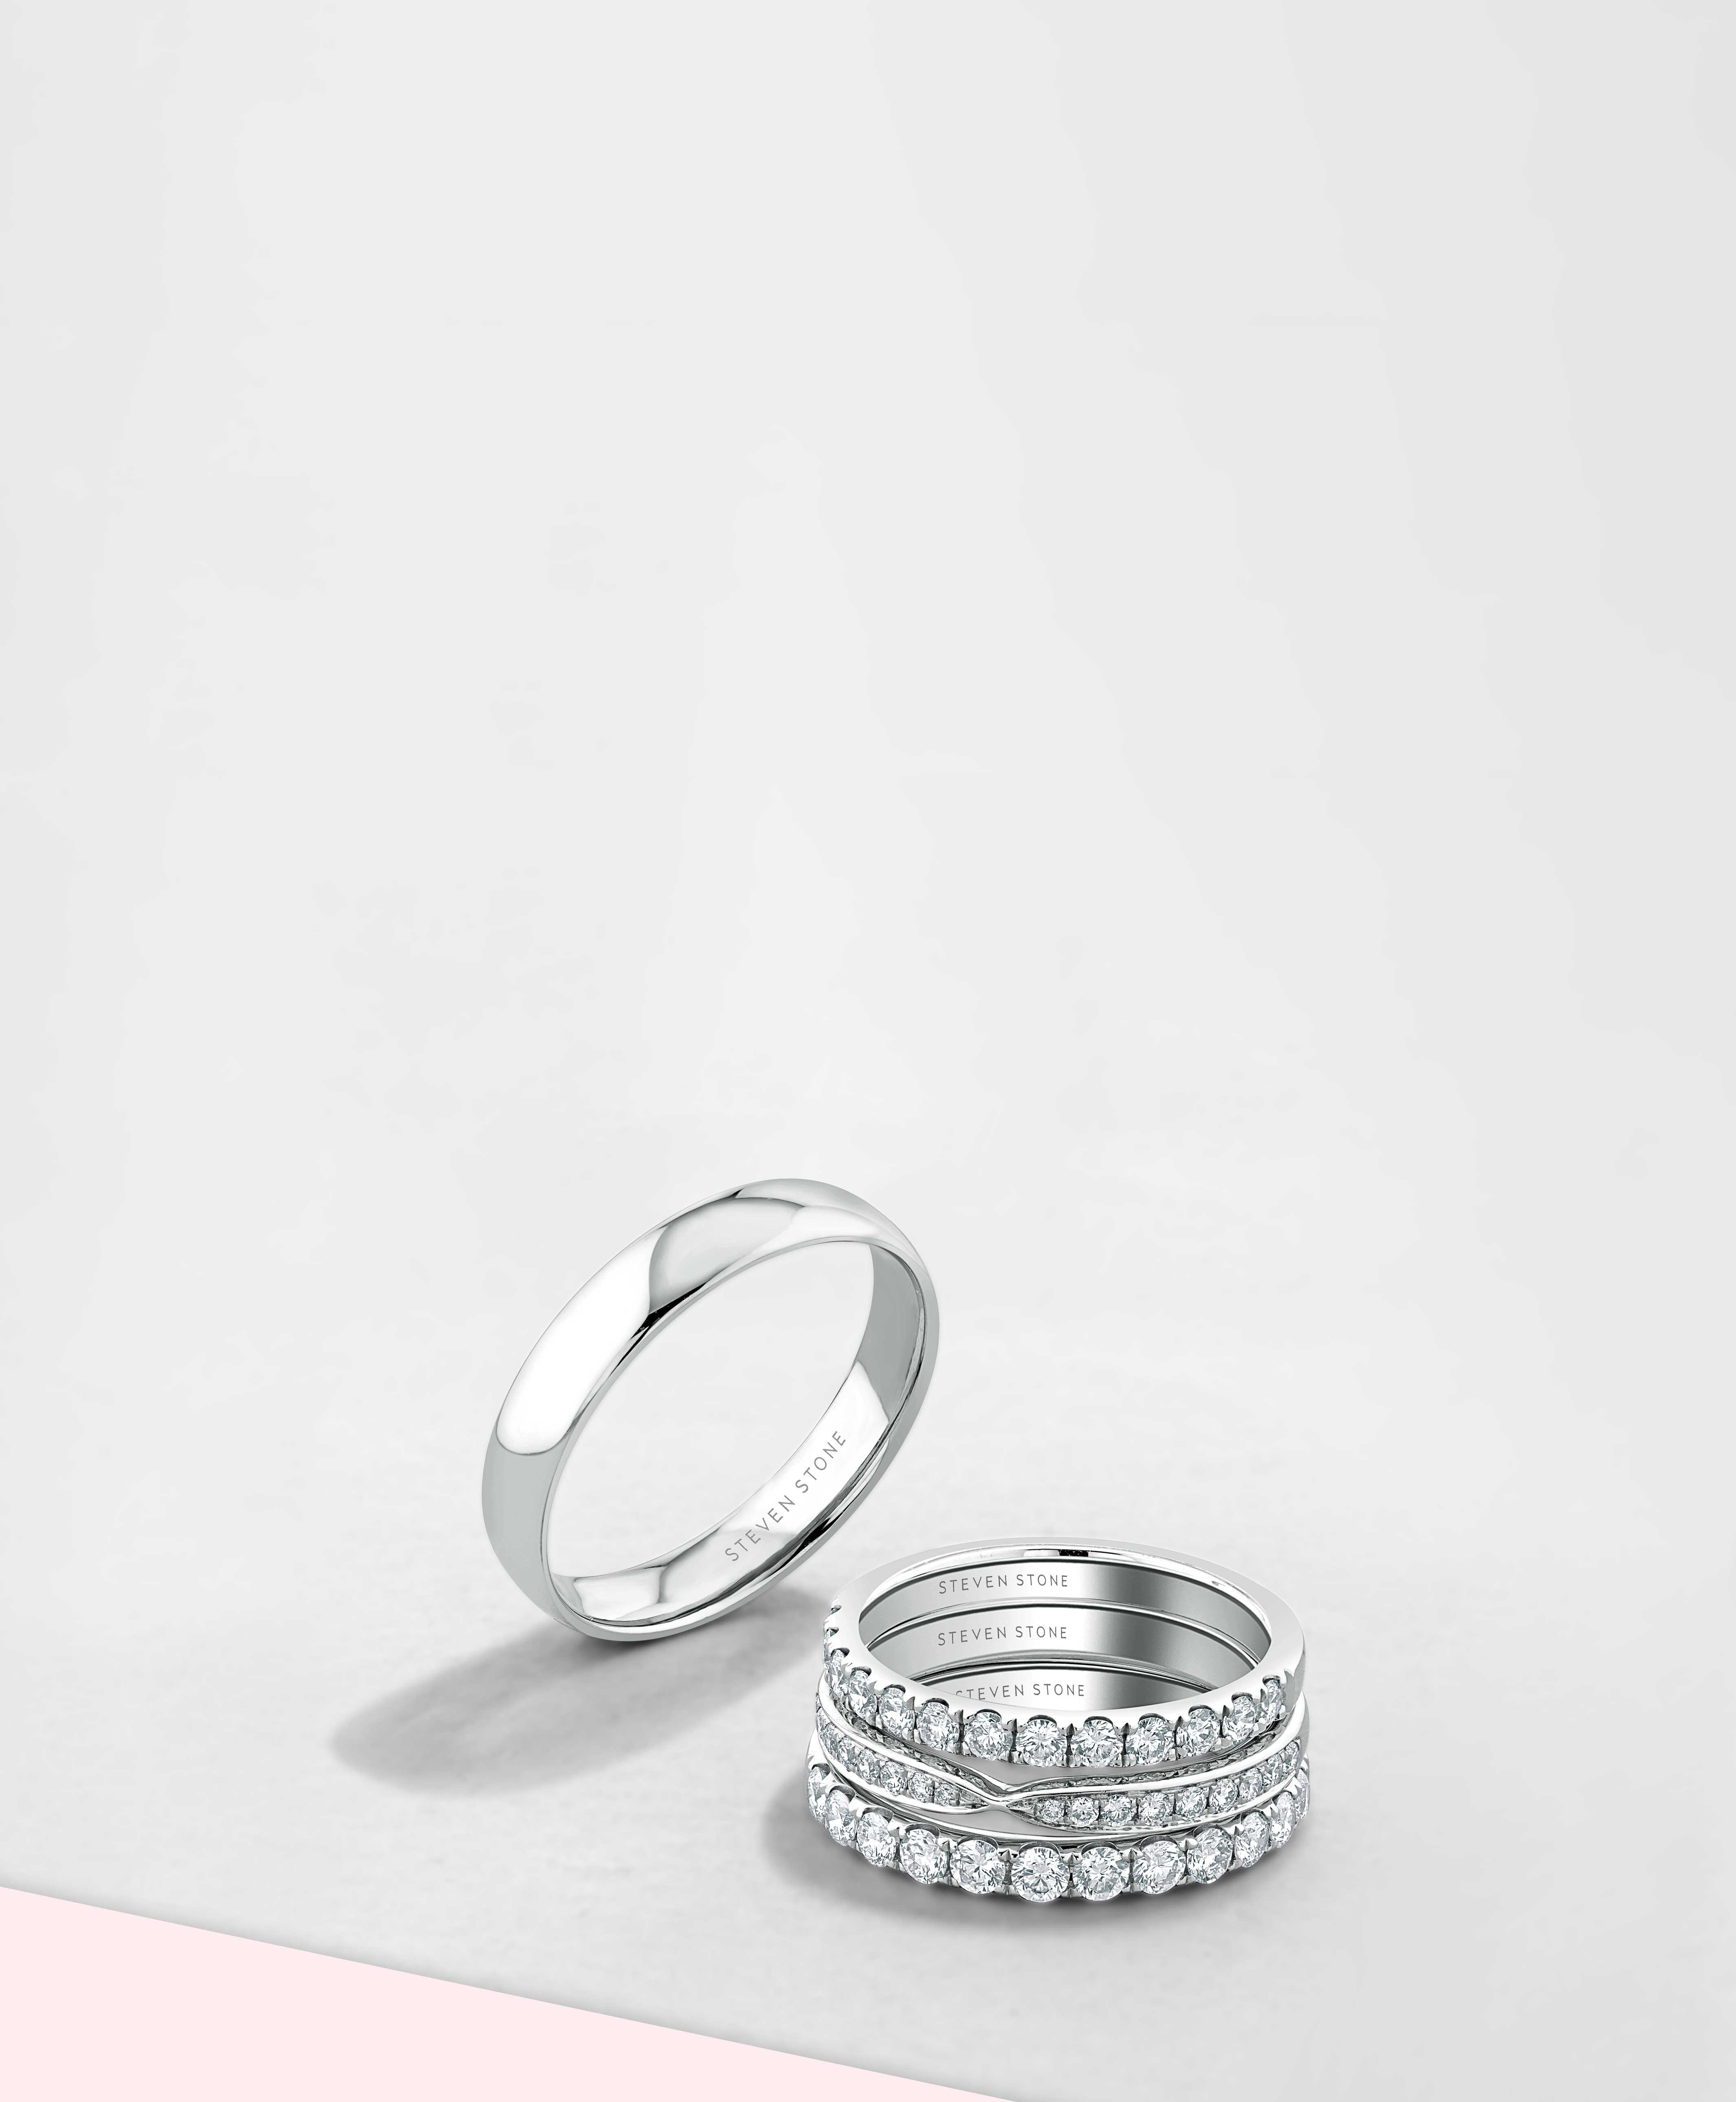 Platinum Diamond Wedding Rings - Steven Stone